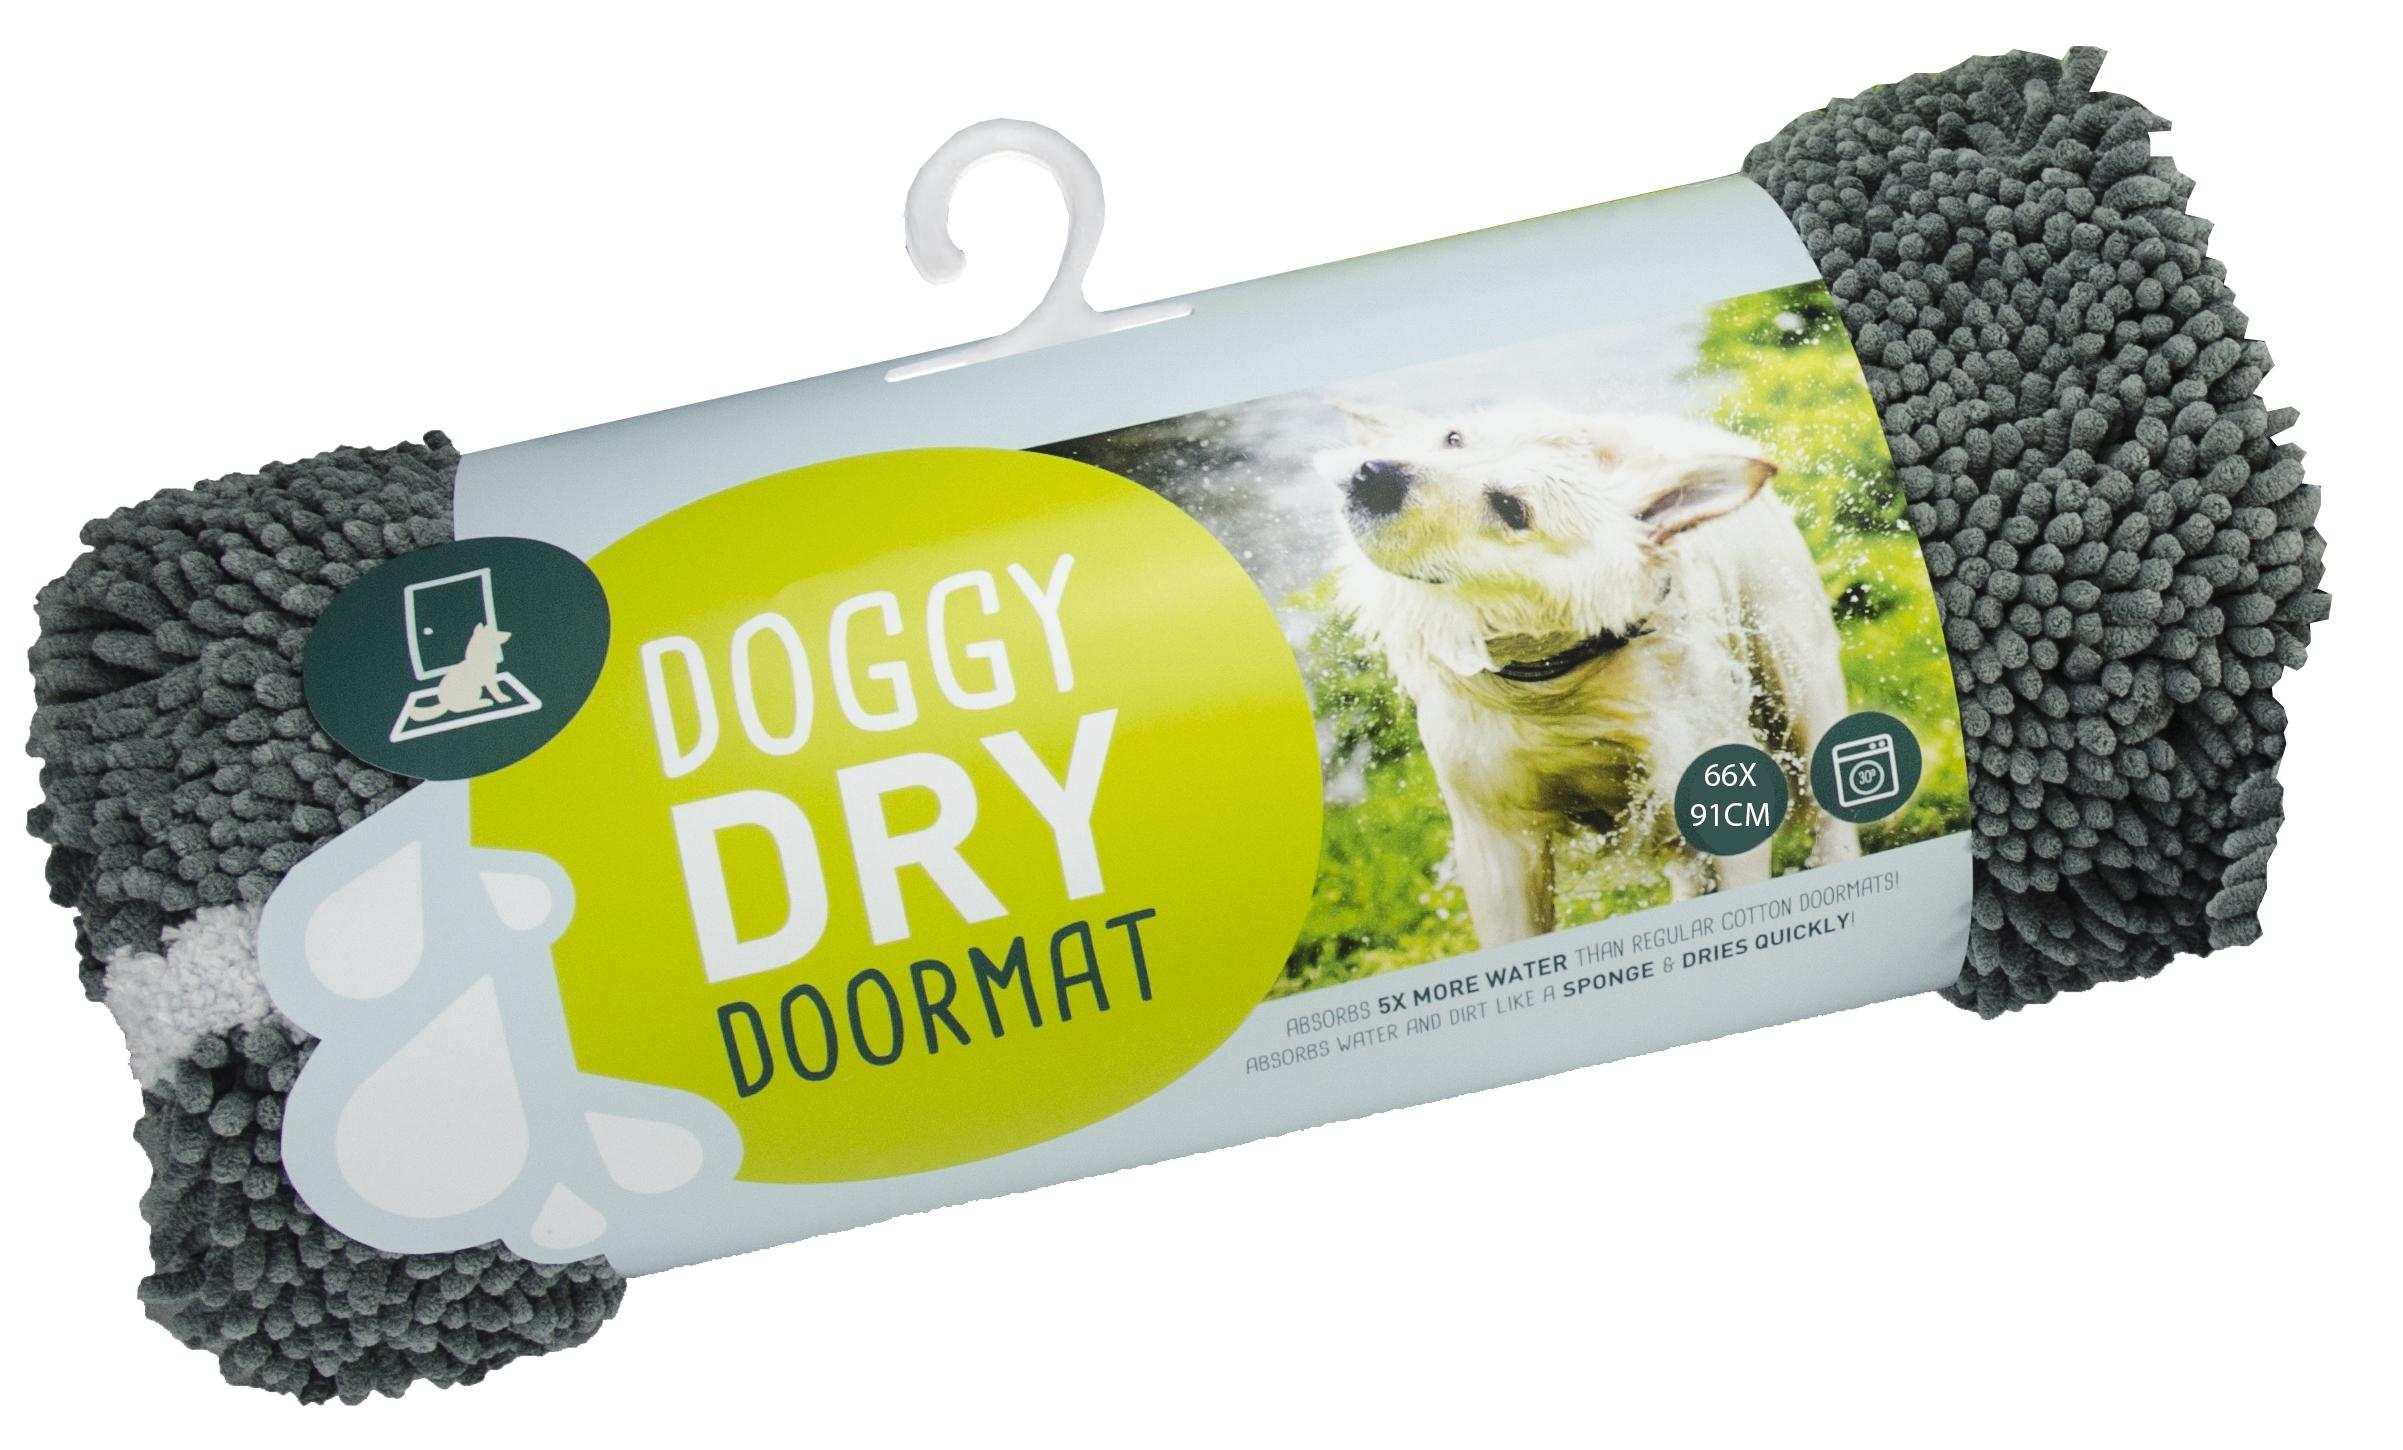 Doggy Dry Doormat 66x91cm